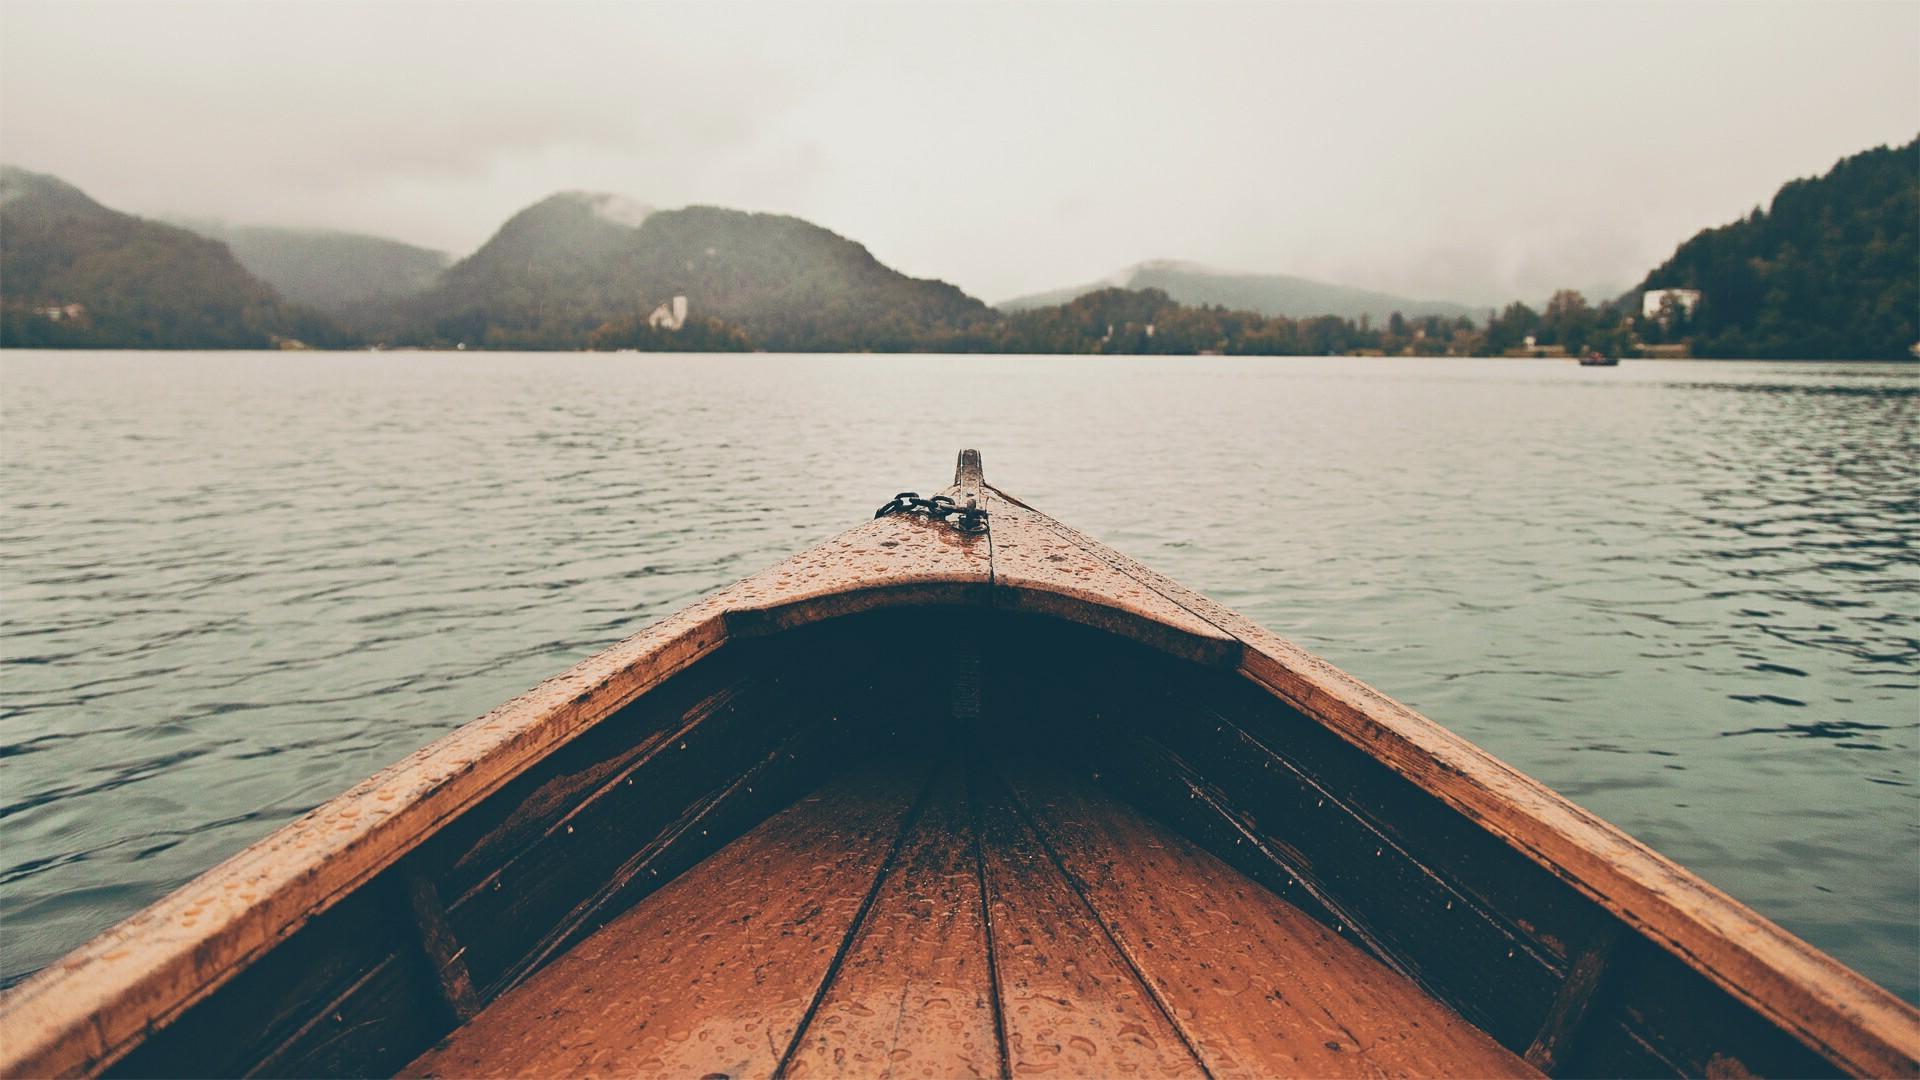 Wallpaper Sunlight Landscape Boat Sea Lake Reflection